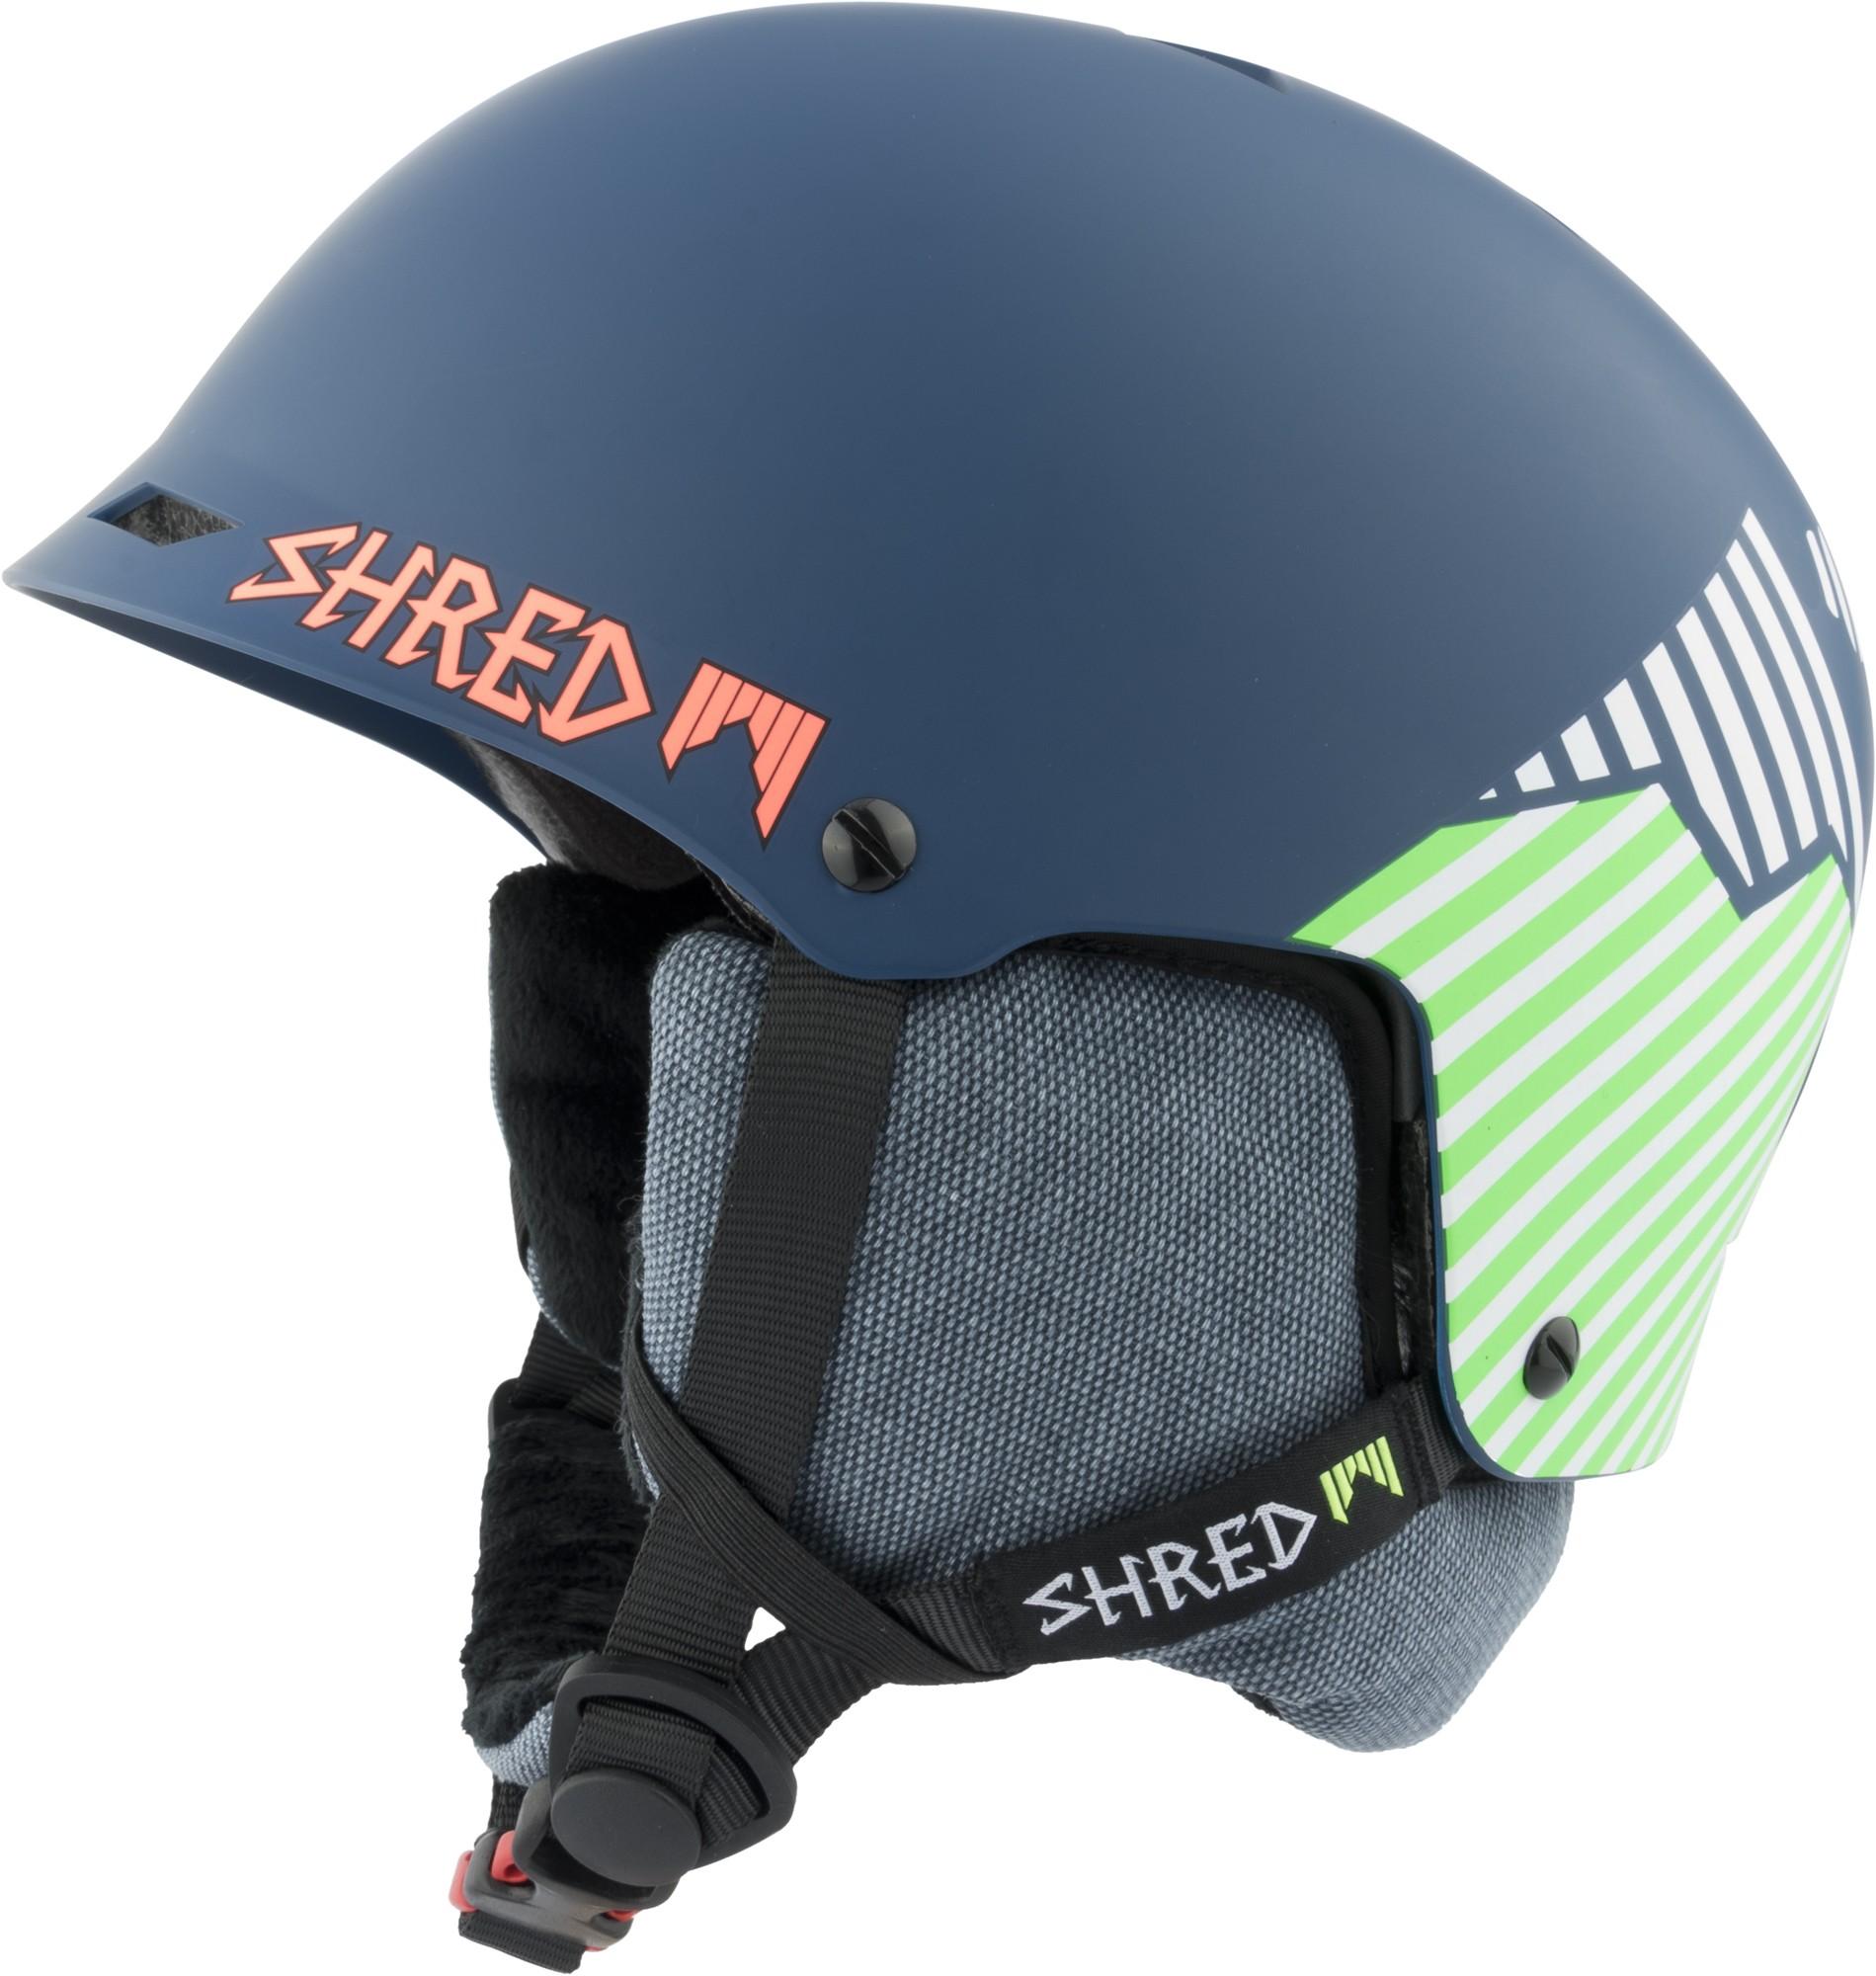 Shred HALF BRAIN D-LUX NEEDMORESNOW ski helmet, 2017